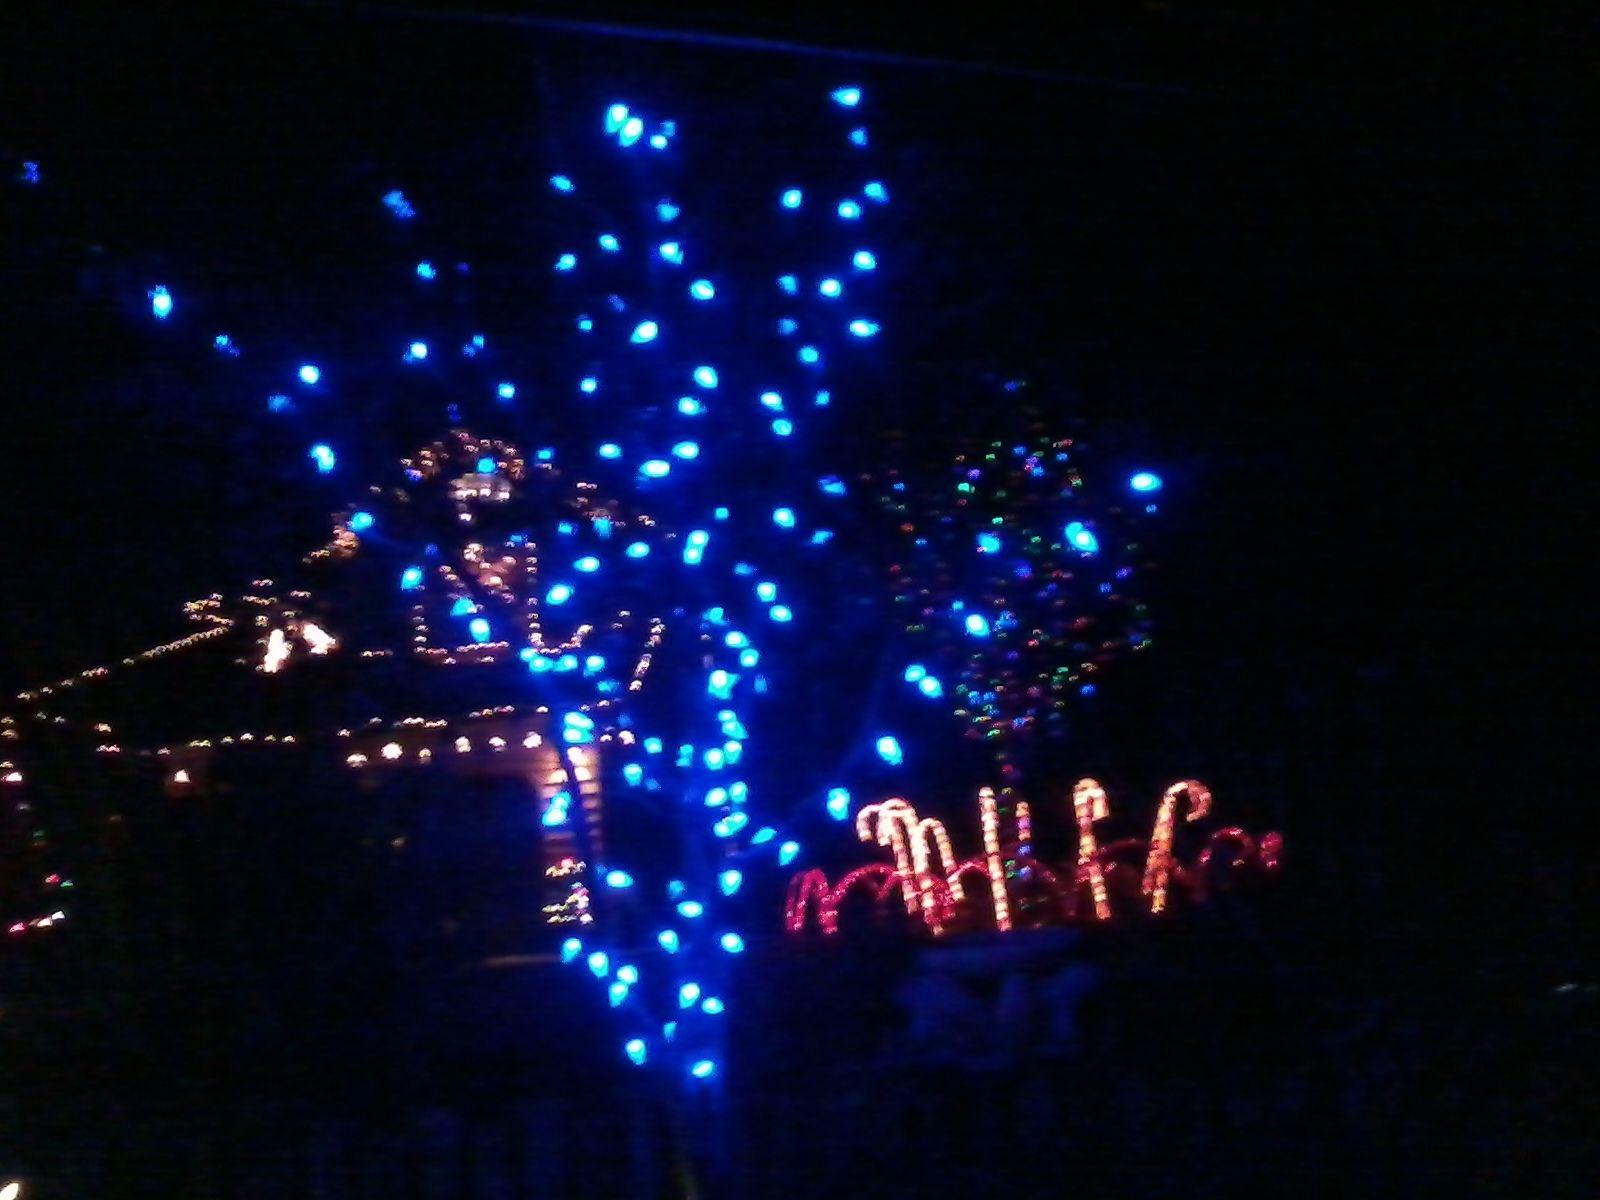 last christmas was so pretty ~xoxo~